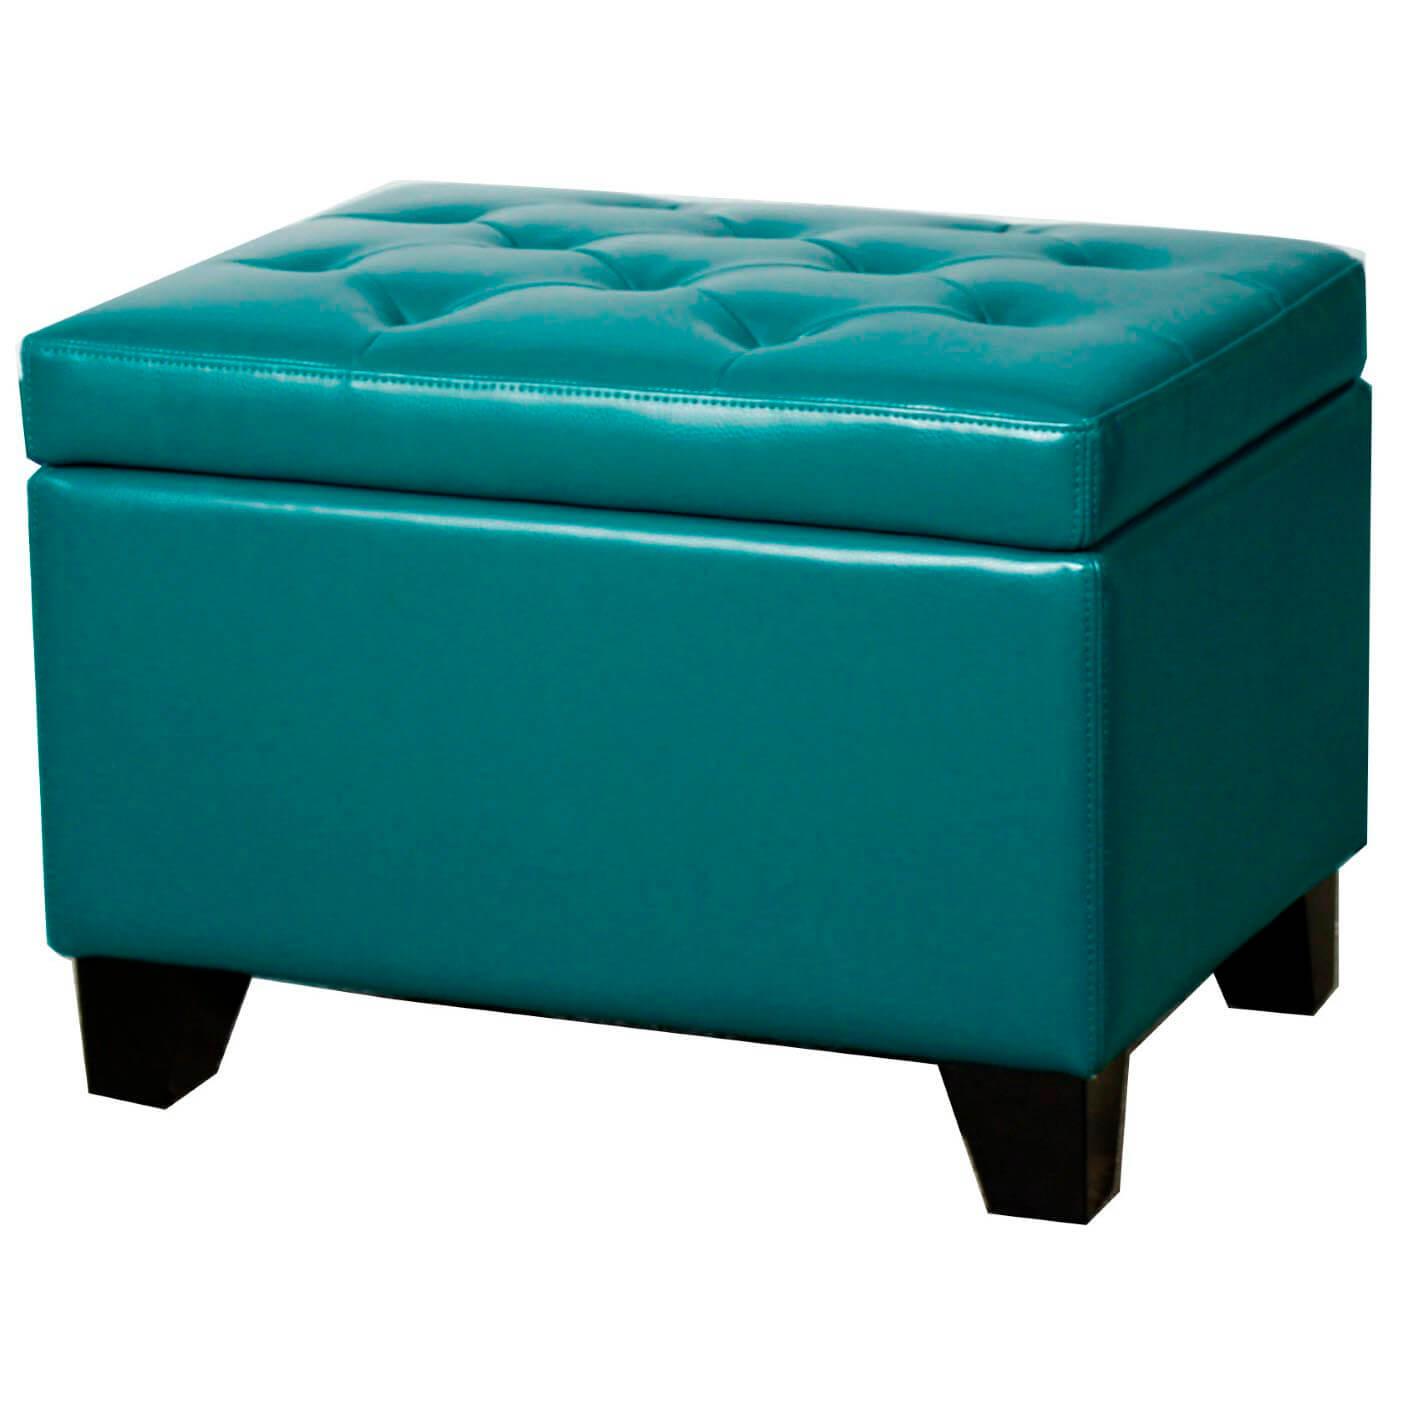 Ordinaire Turquoise